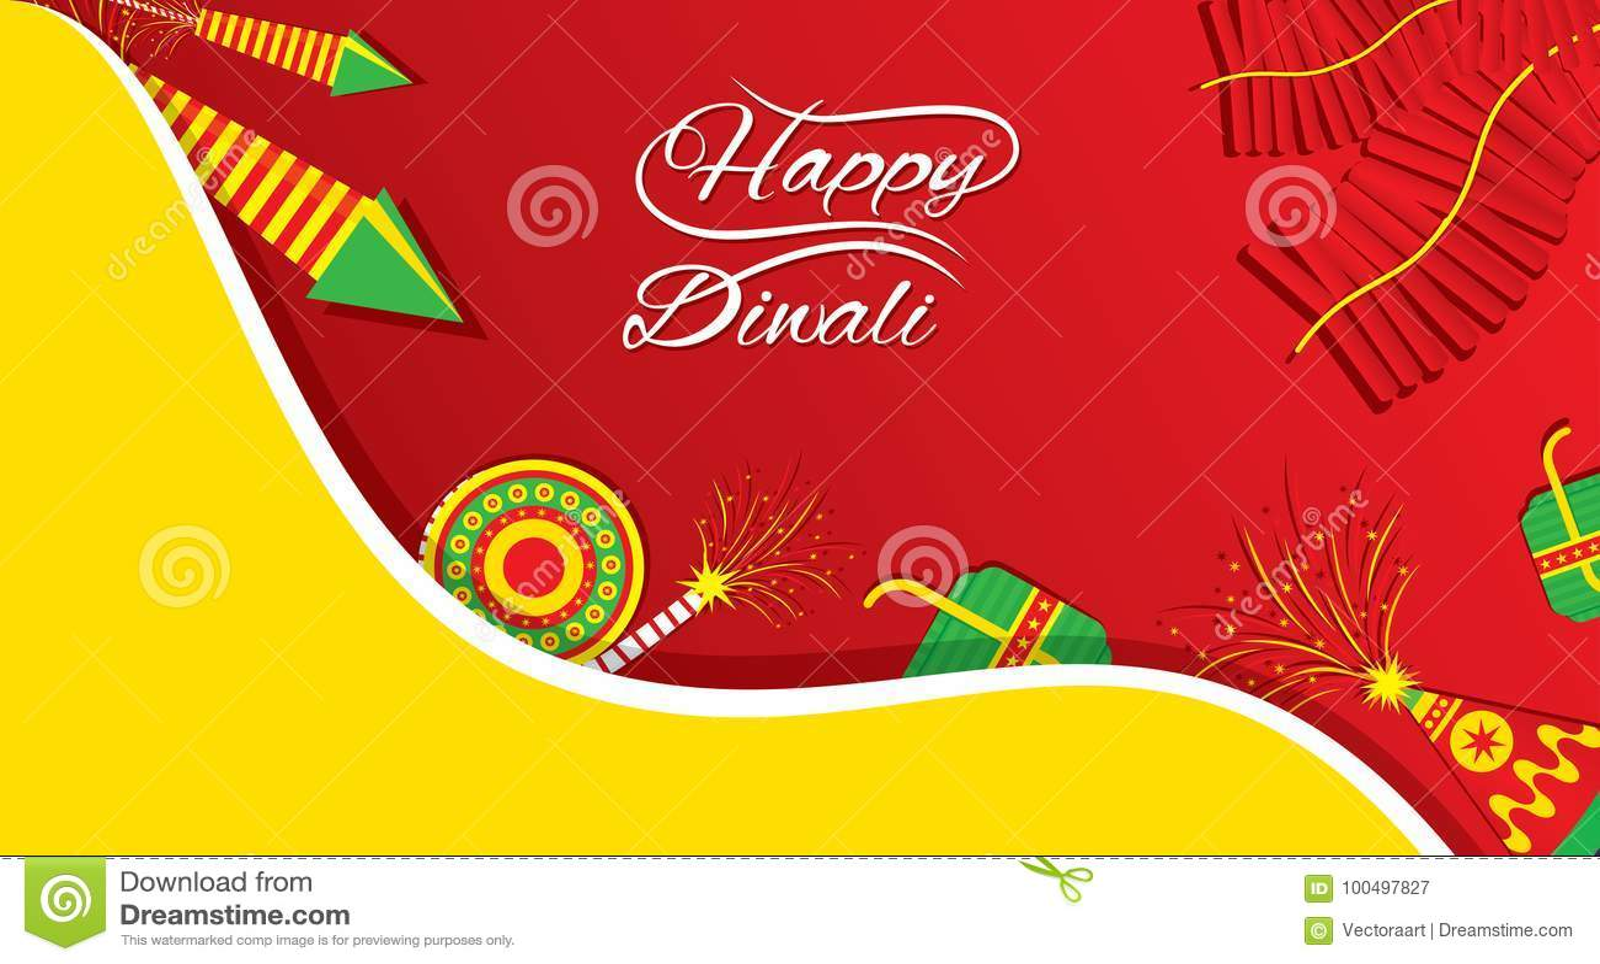 Happy New Year And Happy Diwali 64